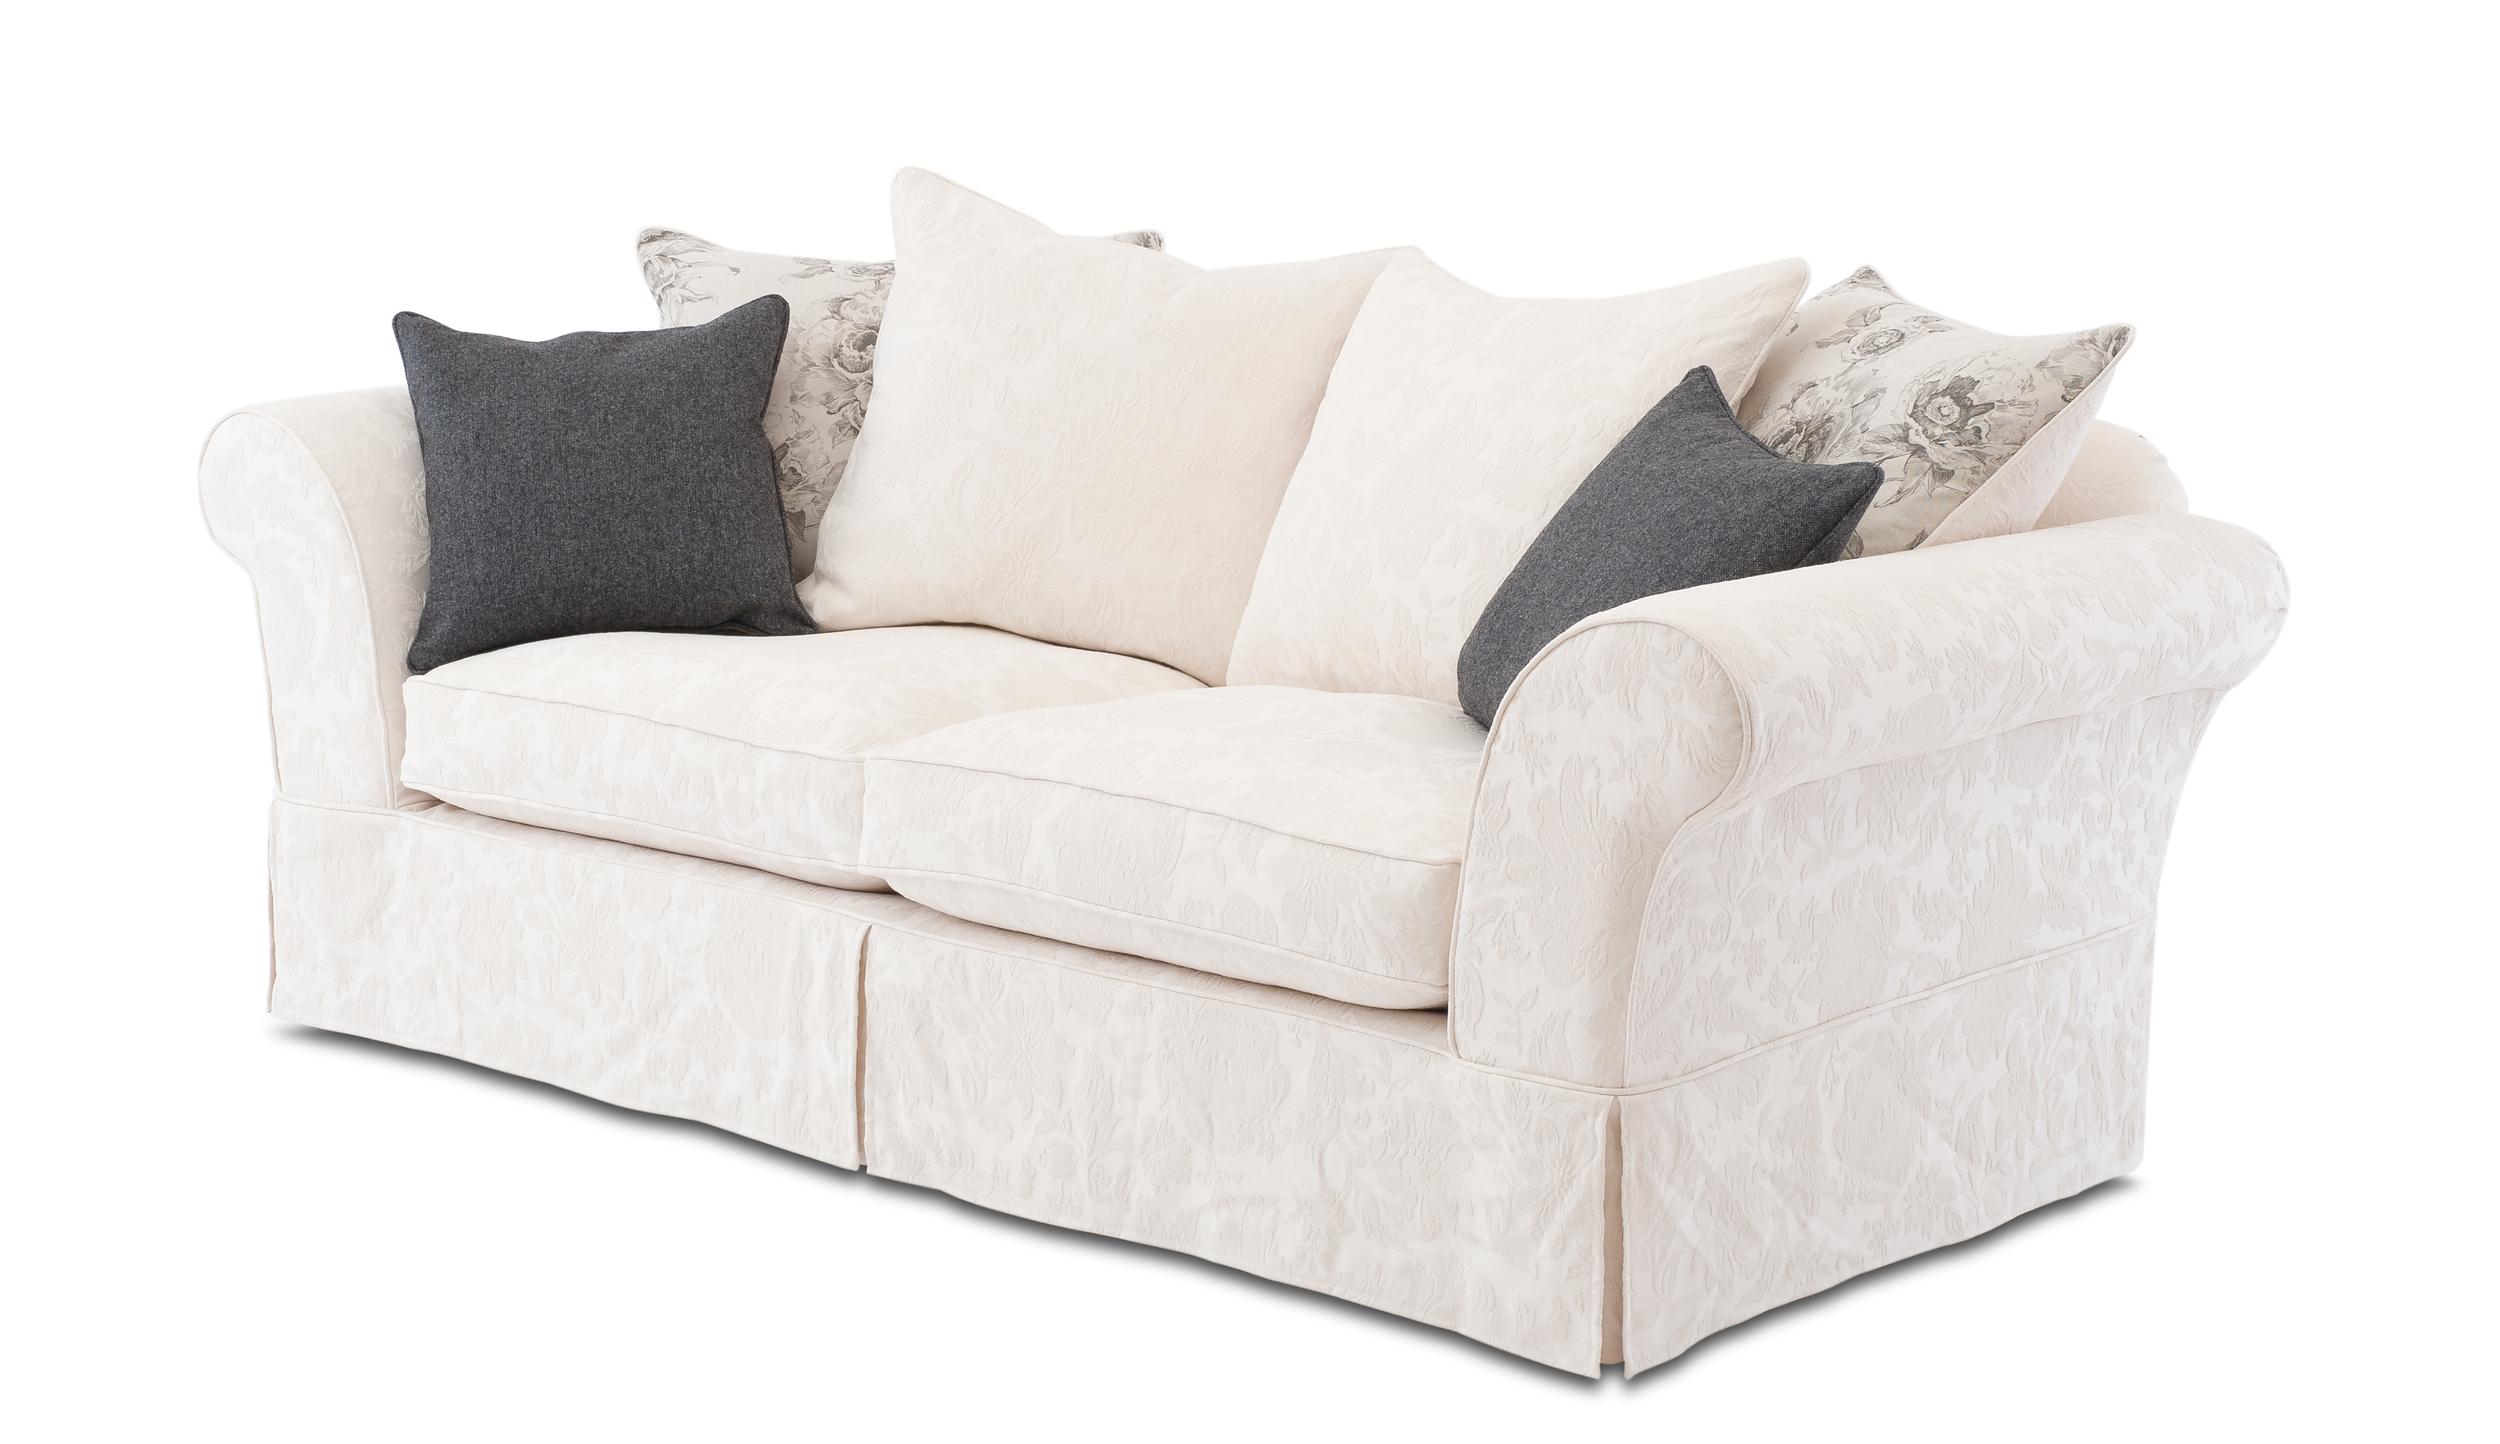 Cleeve 3st Sofa-160.jpg